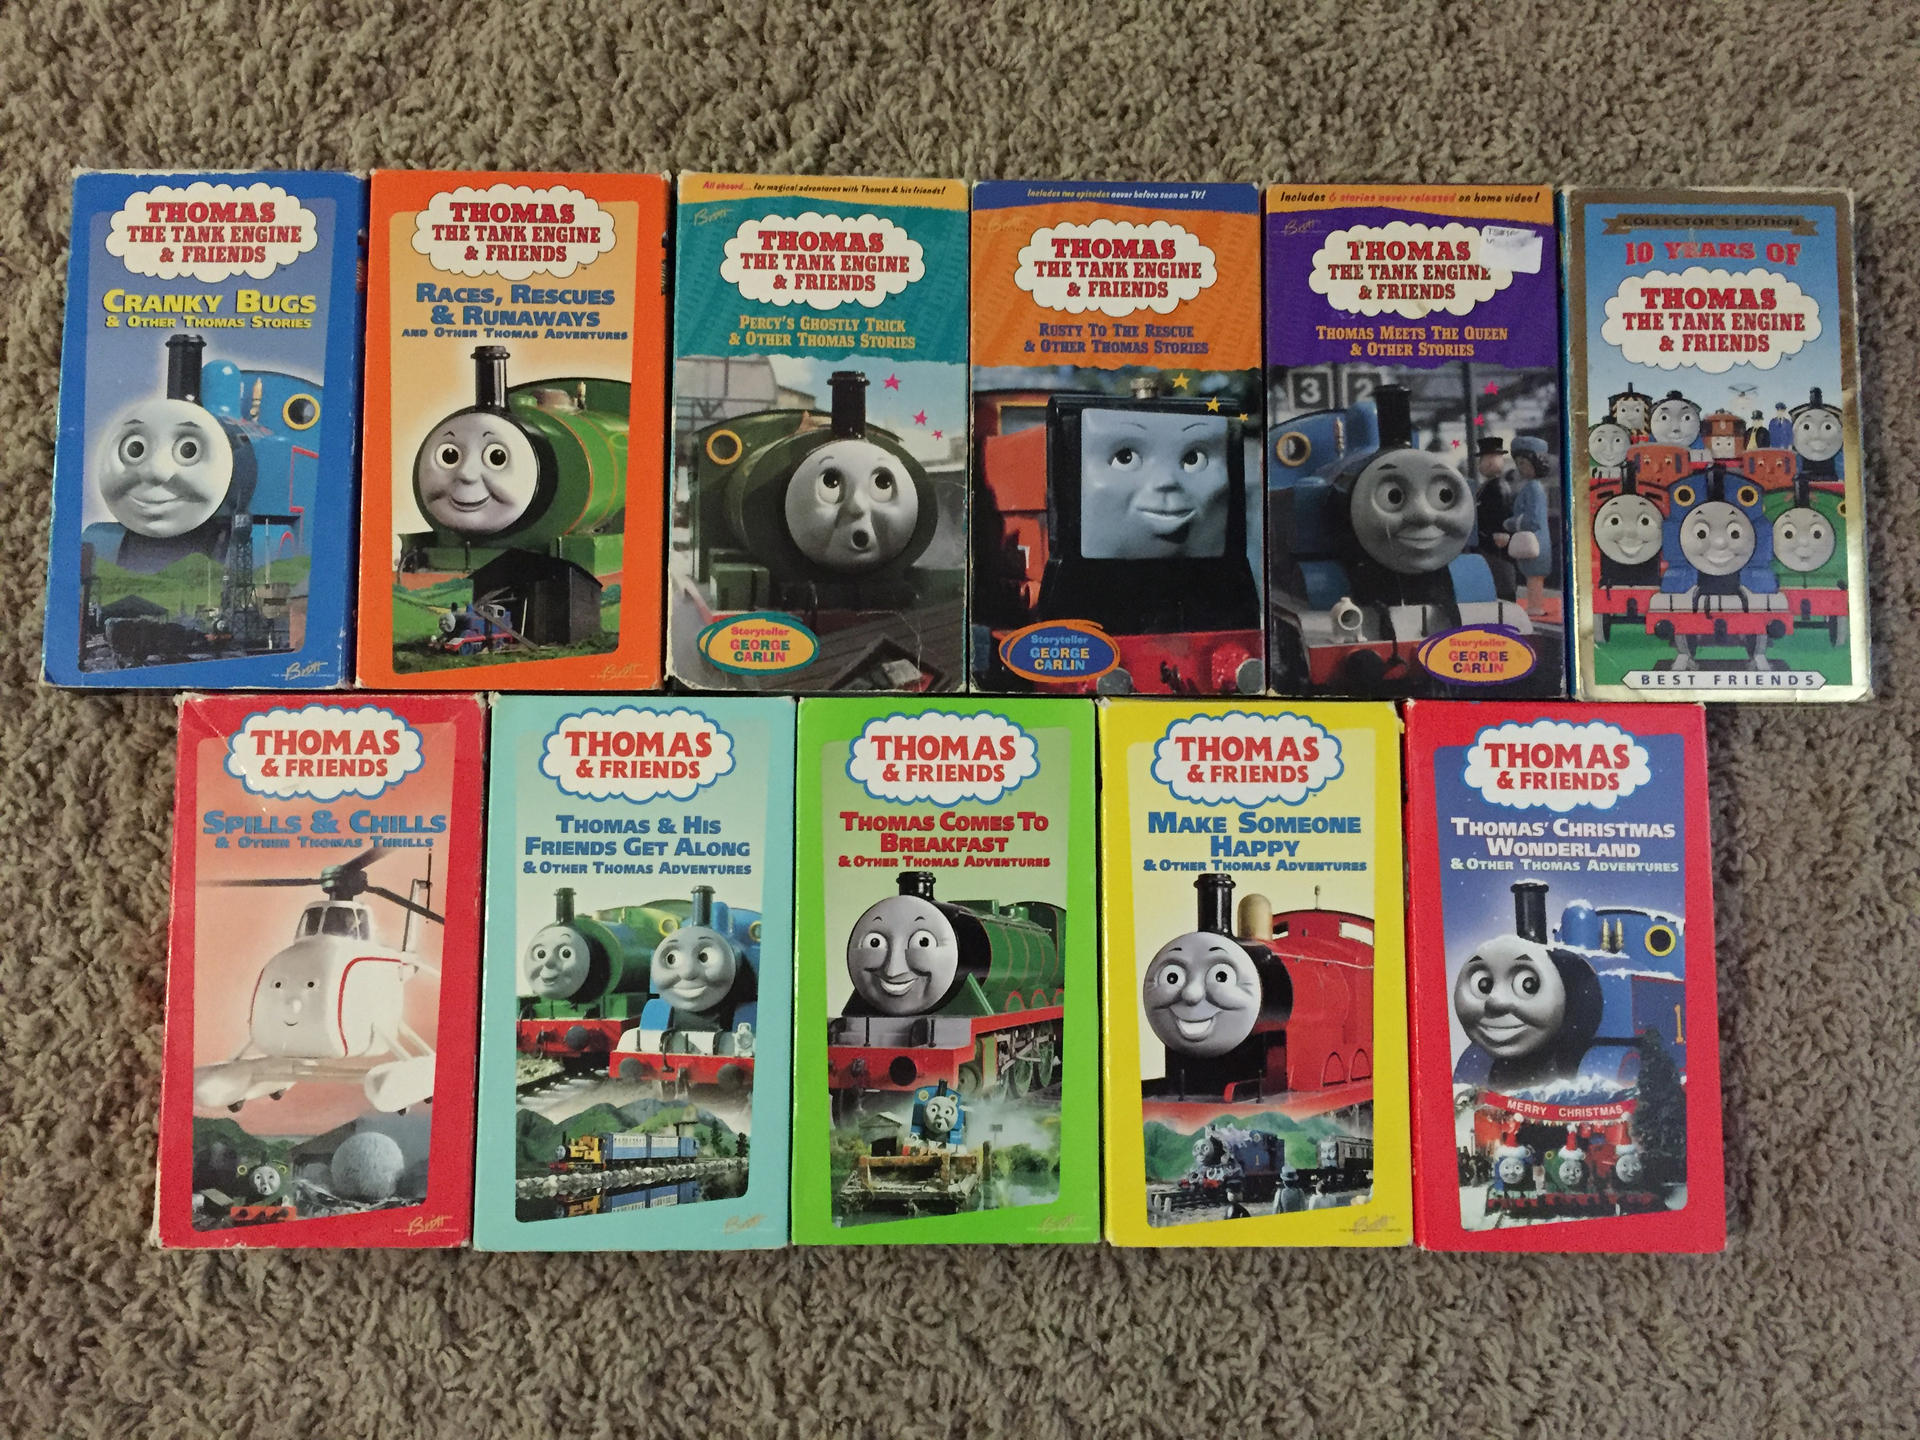 Thomas Christmas Wonderland Vhs.My Thomas Vhs Tapes From The Britt Allcroft Era By